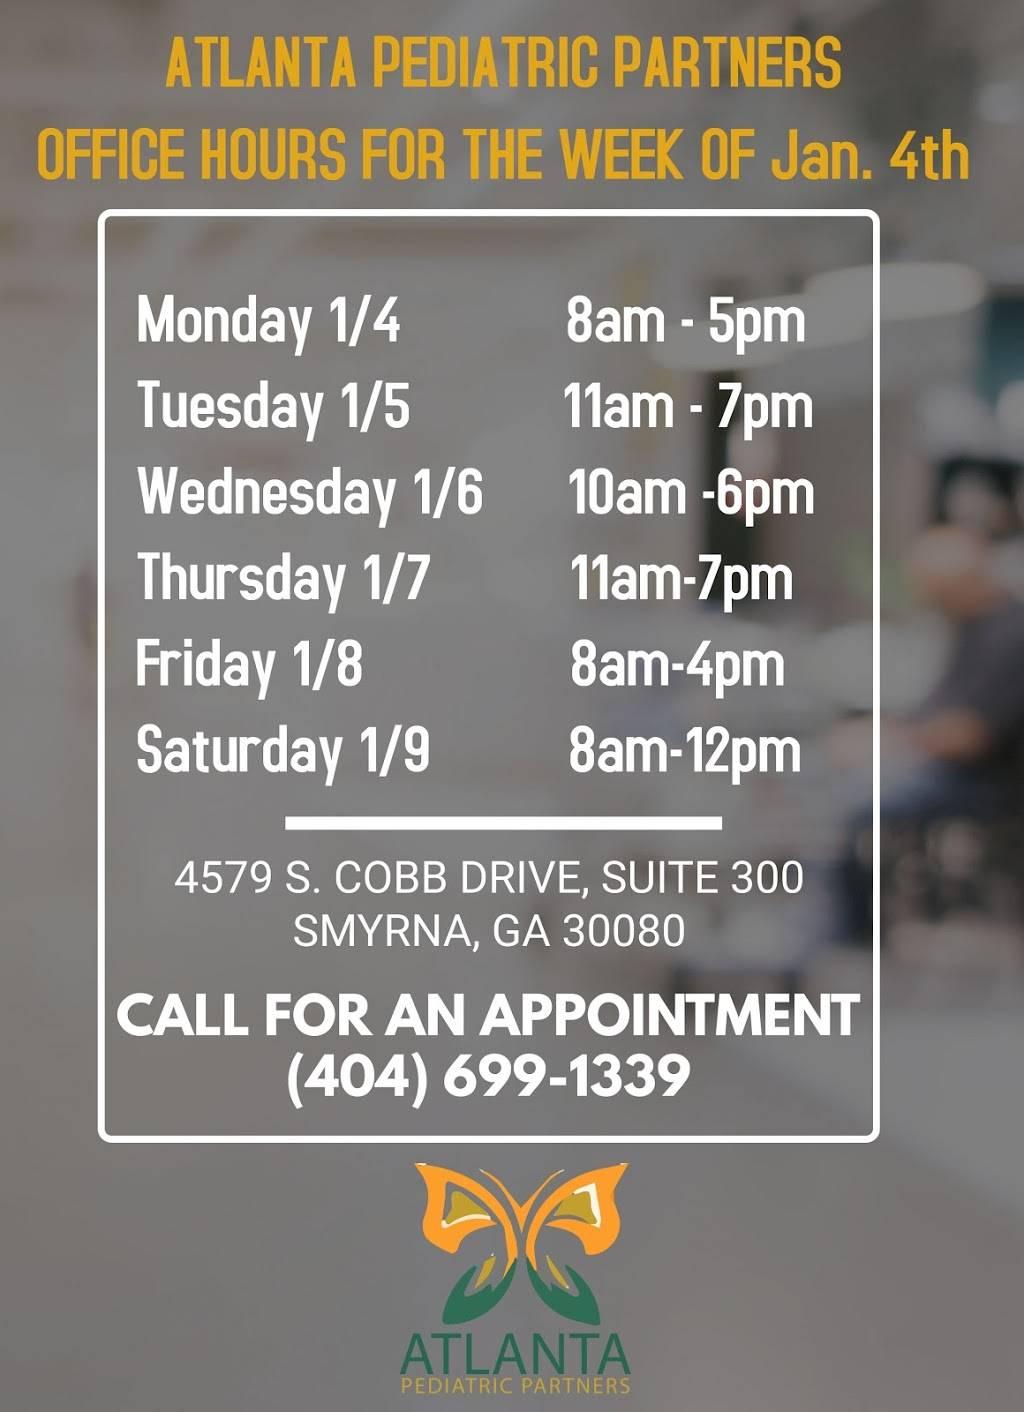 Atlanta Pediatric Partners, PC. - hospital  | Photo 5 of 7 | Address: 4579 S Cobb Dr SE Suite 300, Smyrna, GA 30080, USA | Phone: (404) 699-1339